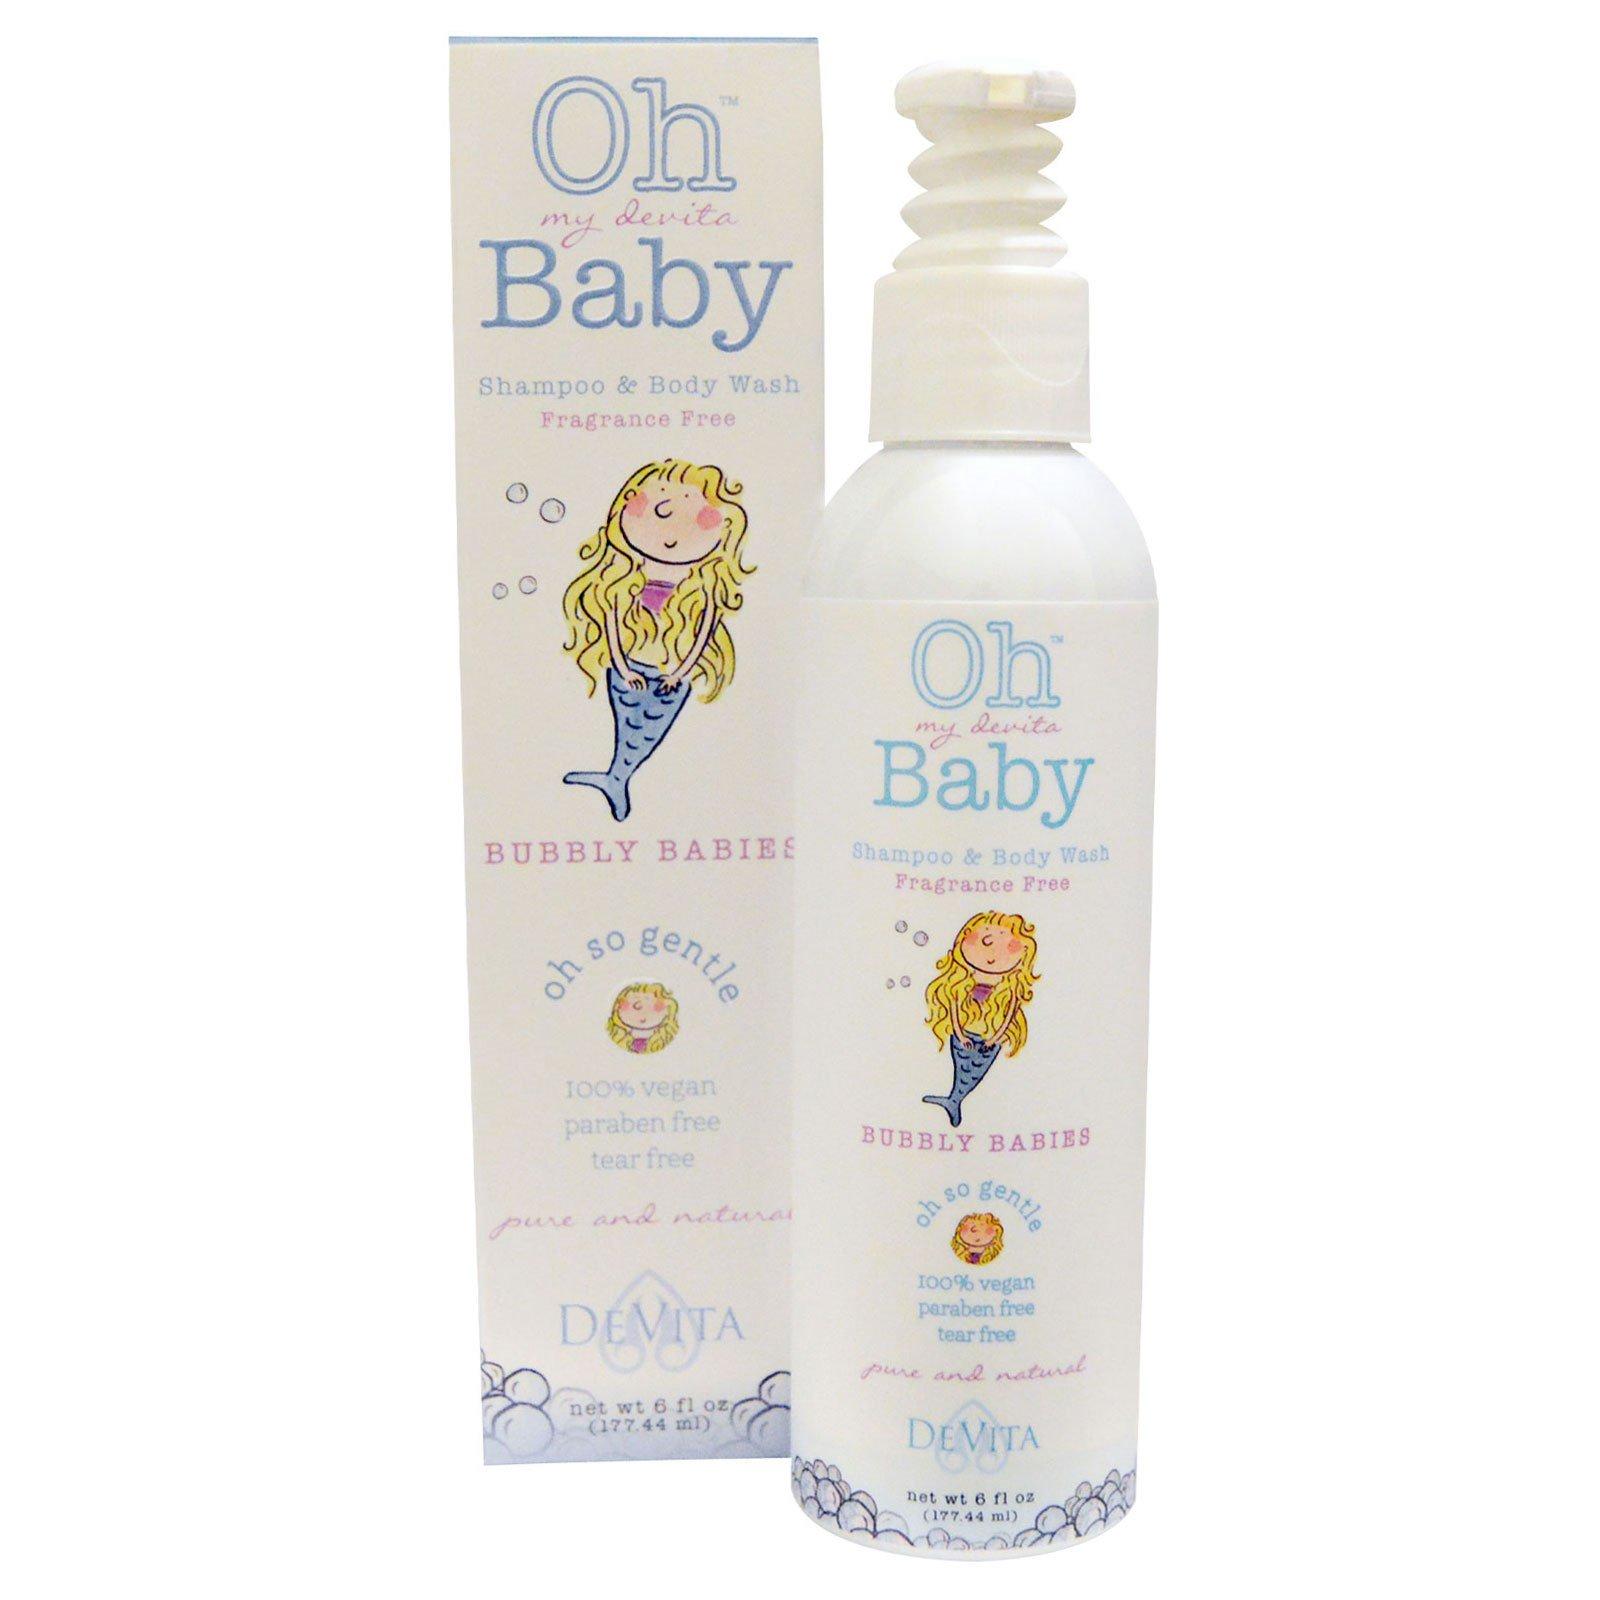 DeVita, Oh My Devita Baby, шампунь для волос и тела, Bubbly babies, без отдушек, 6 жидких унций (177.44 мл)